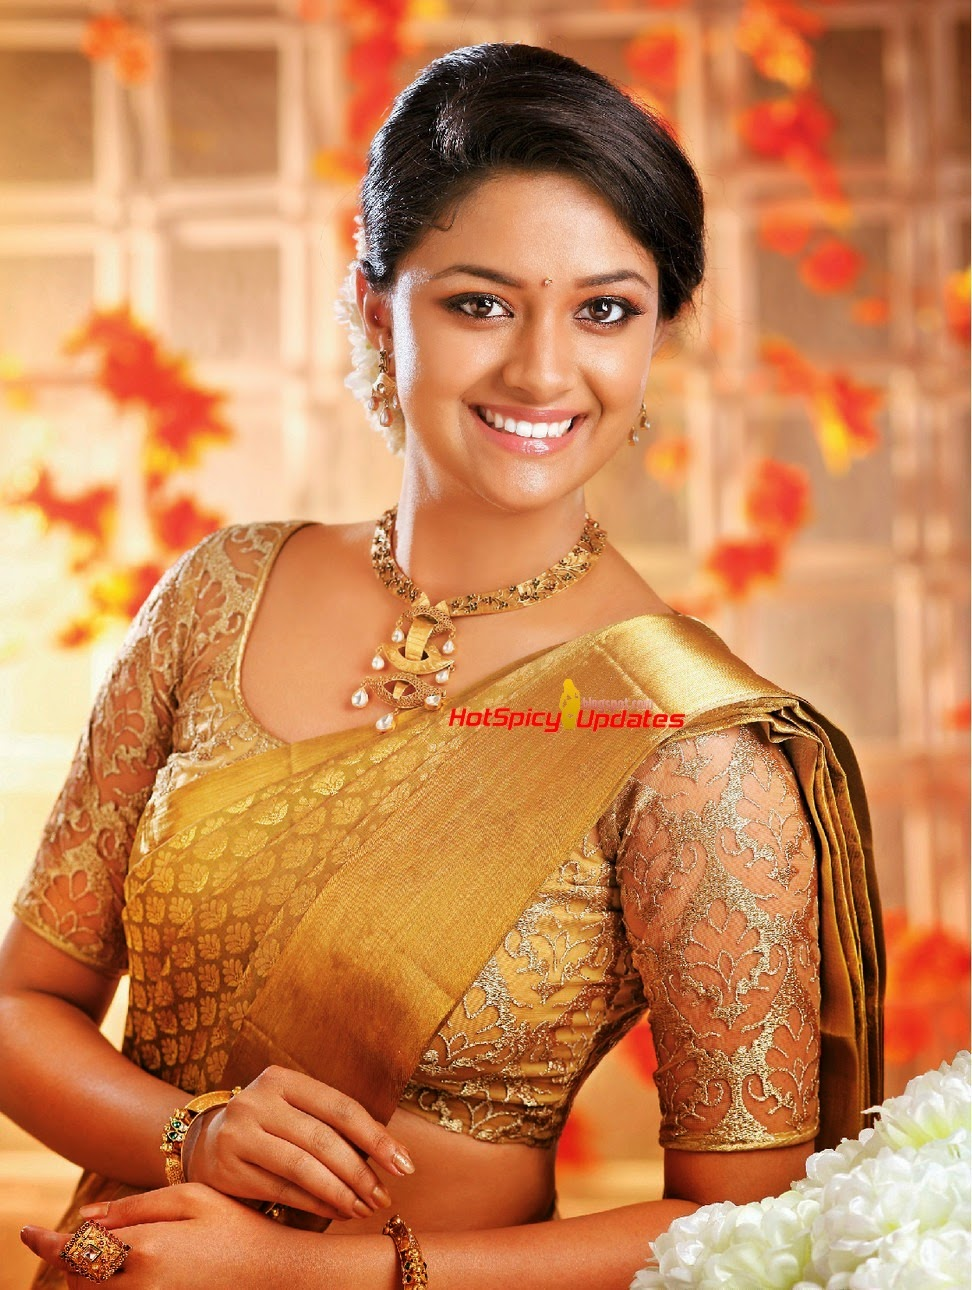 keerthi-suresh-beautiful-photos-and-hot-stills-in-saree-25.jpg